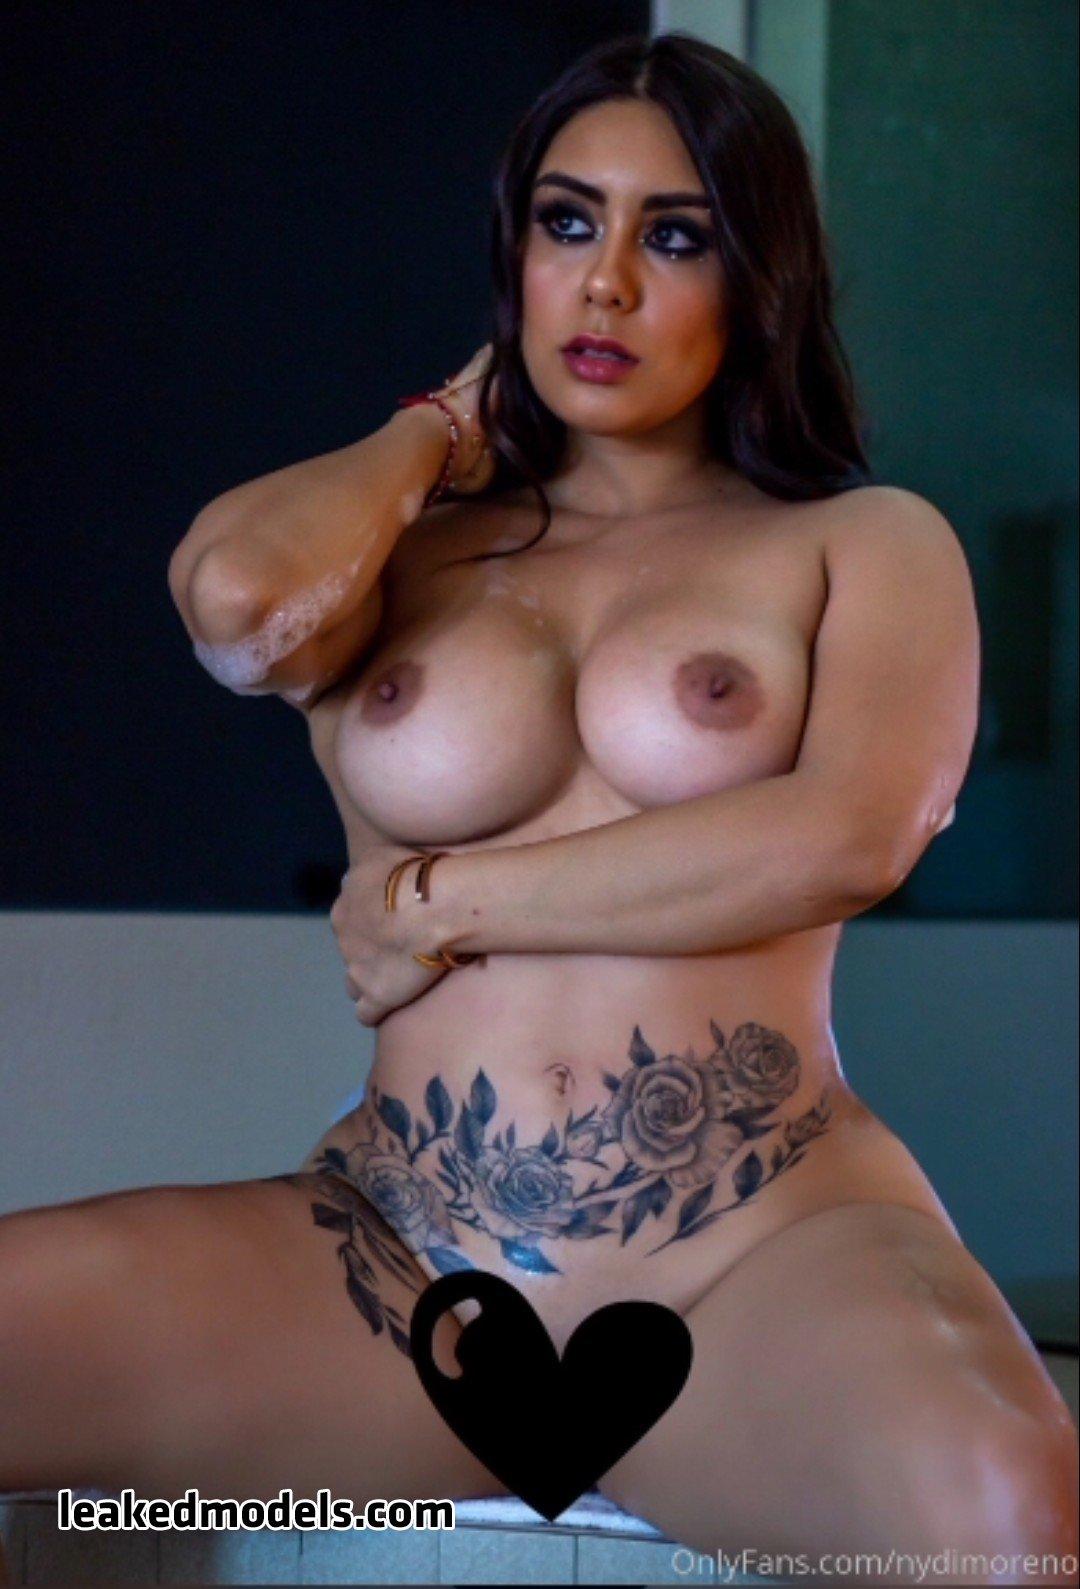 nydimoreno leaked nude leakedmodels.com 0003 - Nydia Moreno – nydimoreno OnlyFans Nude Leaks (25 Photos)